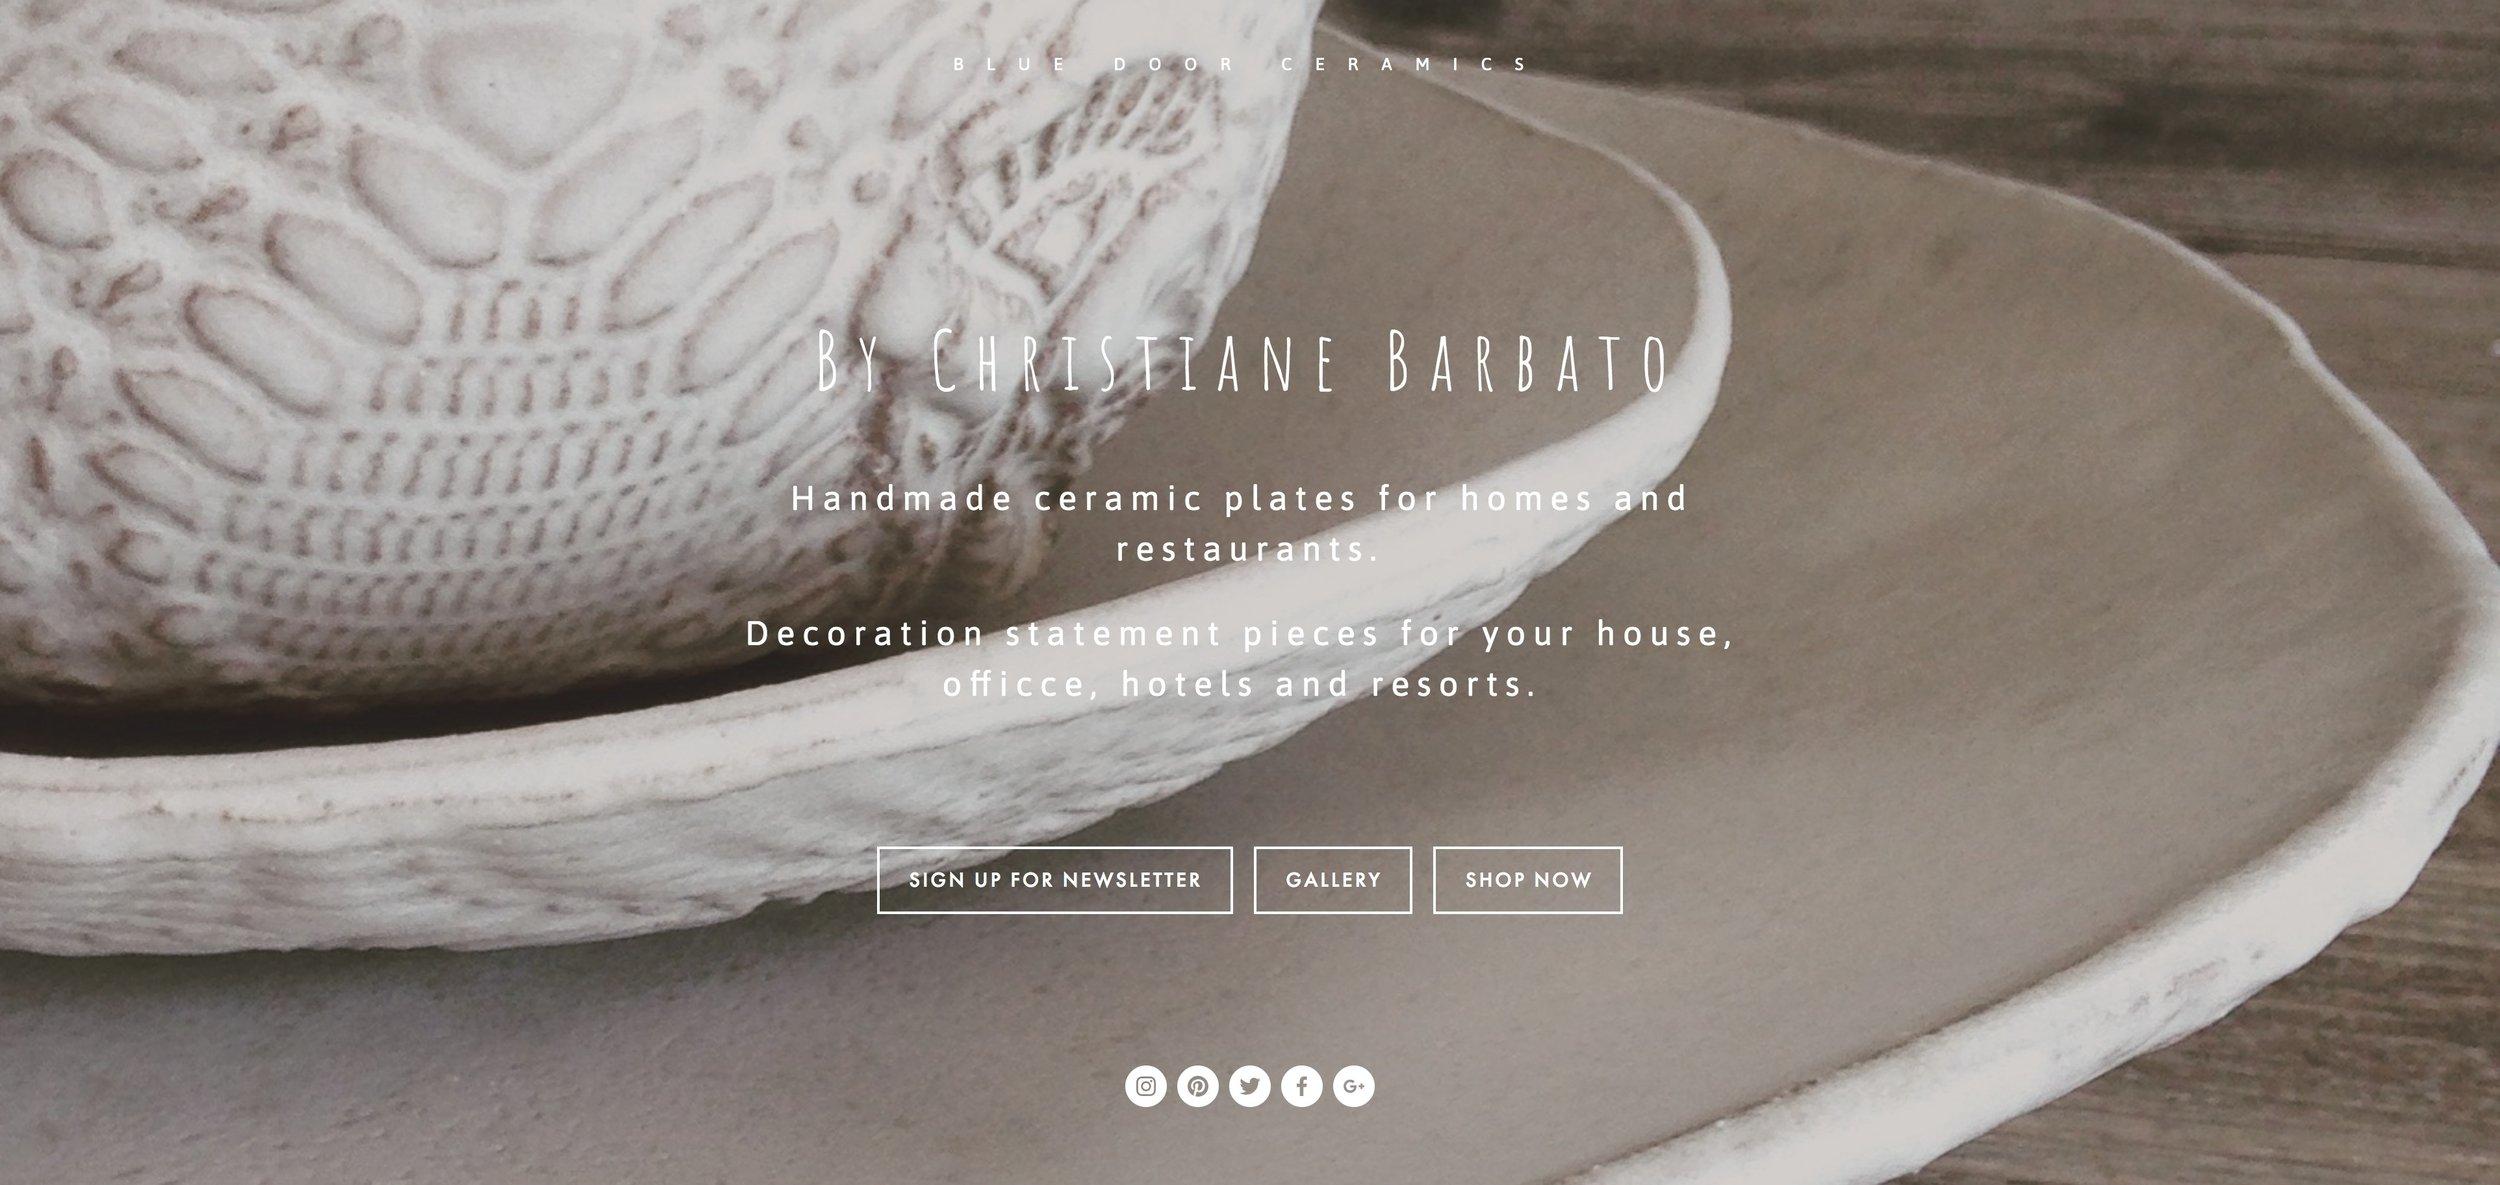 The original home page